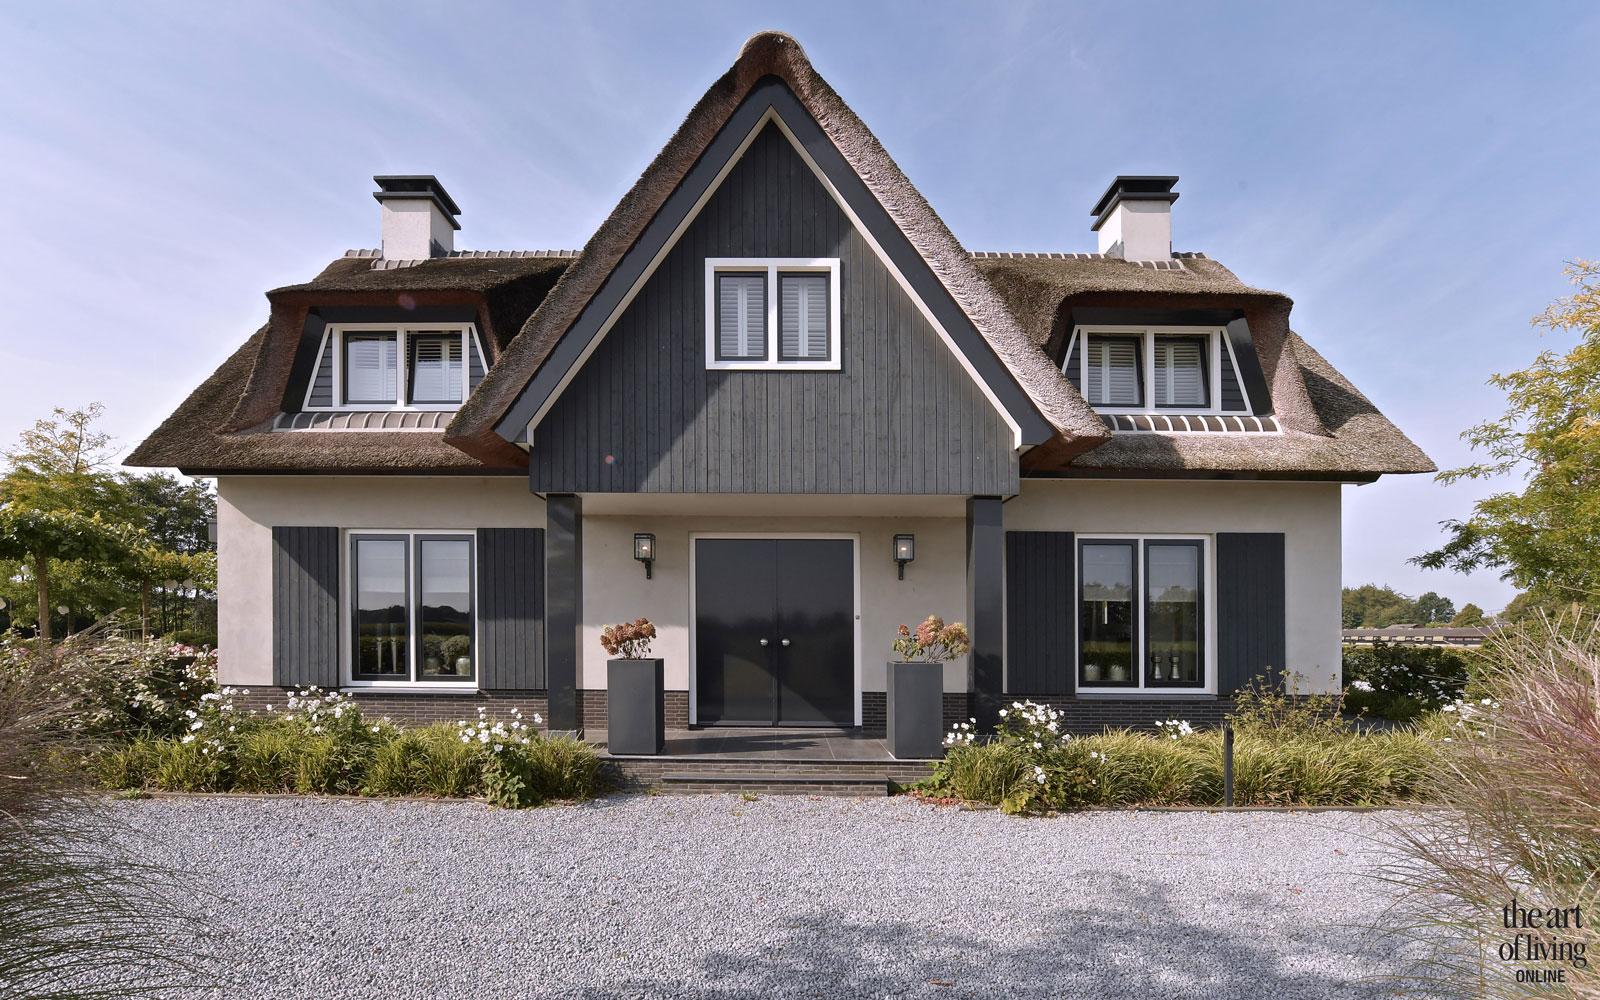 Farmhouse Keuken Landelijk : Landelijk boxxis architecten the art of living nl